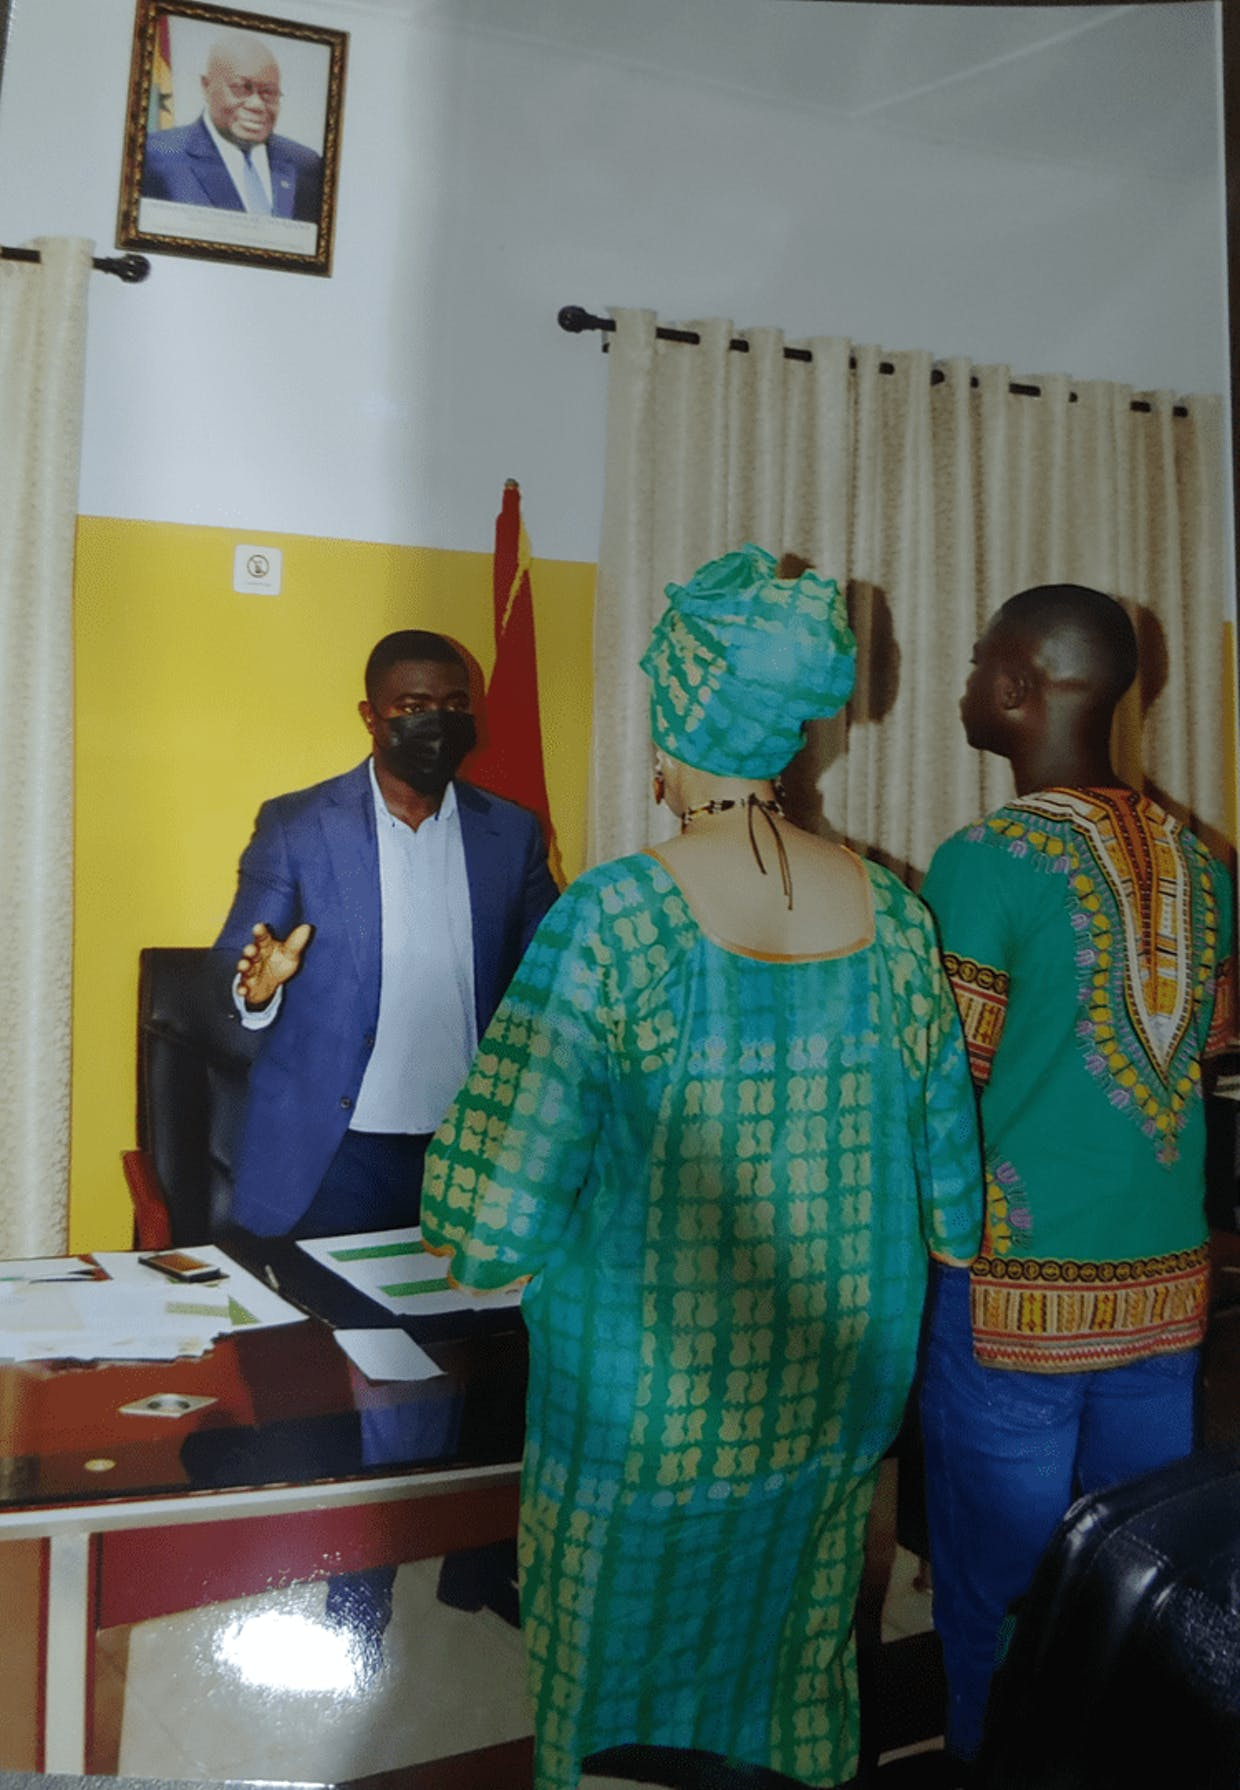 Counselor of Ghana